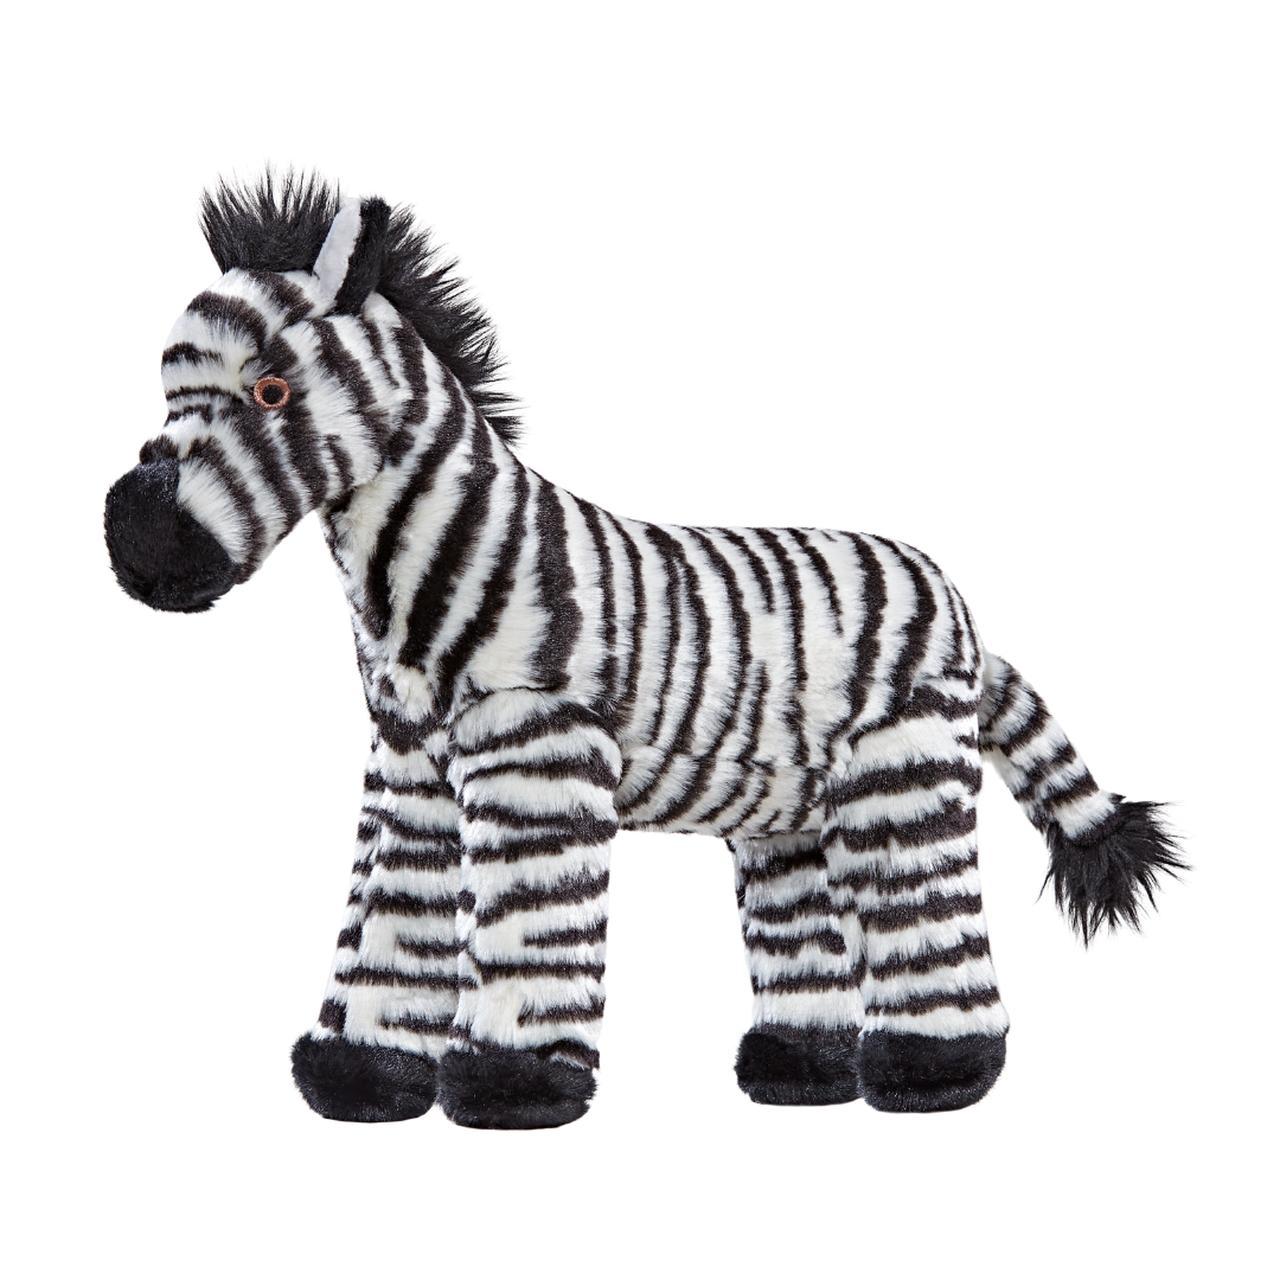 Fluff & Tuff Bob Zebra Dog Toy, 11.5-in